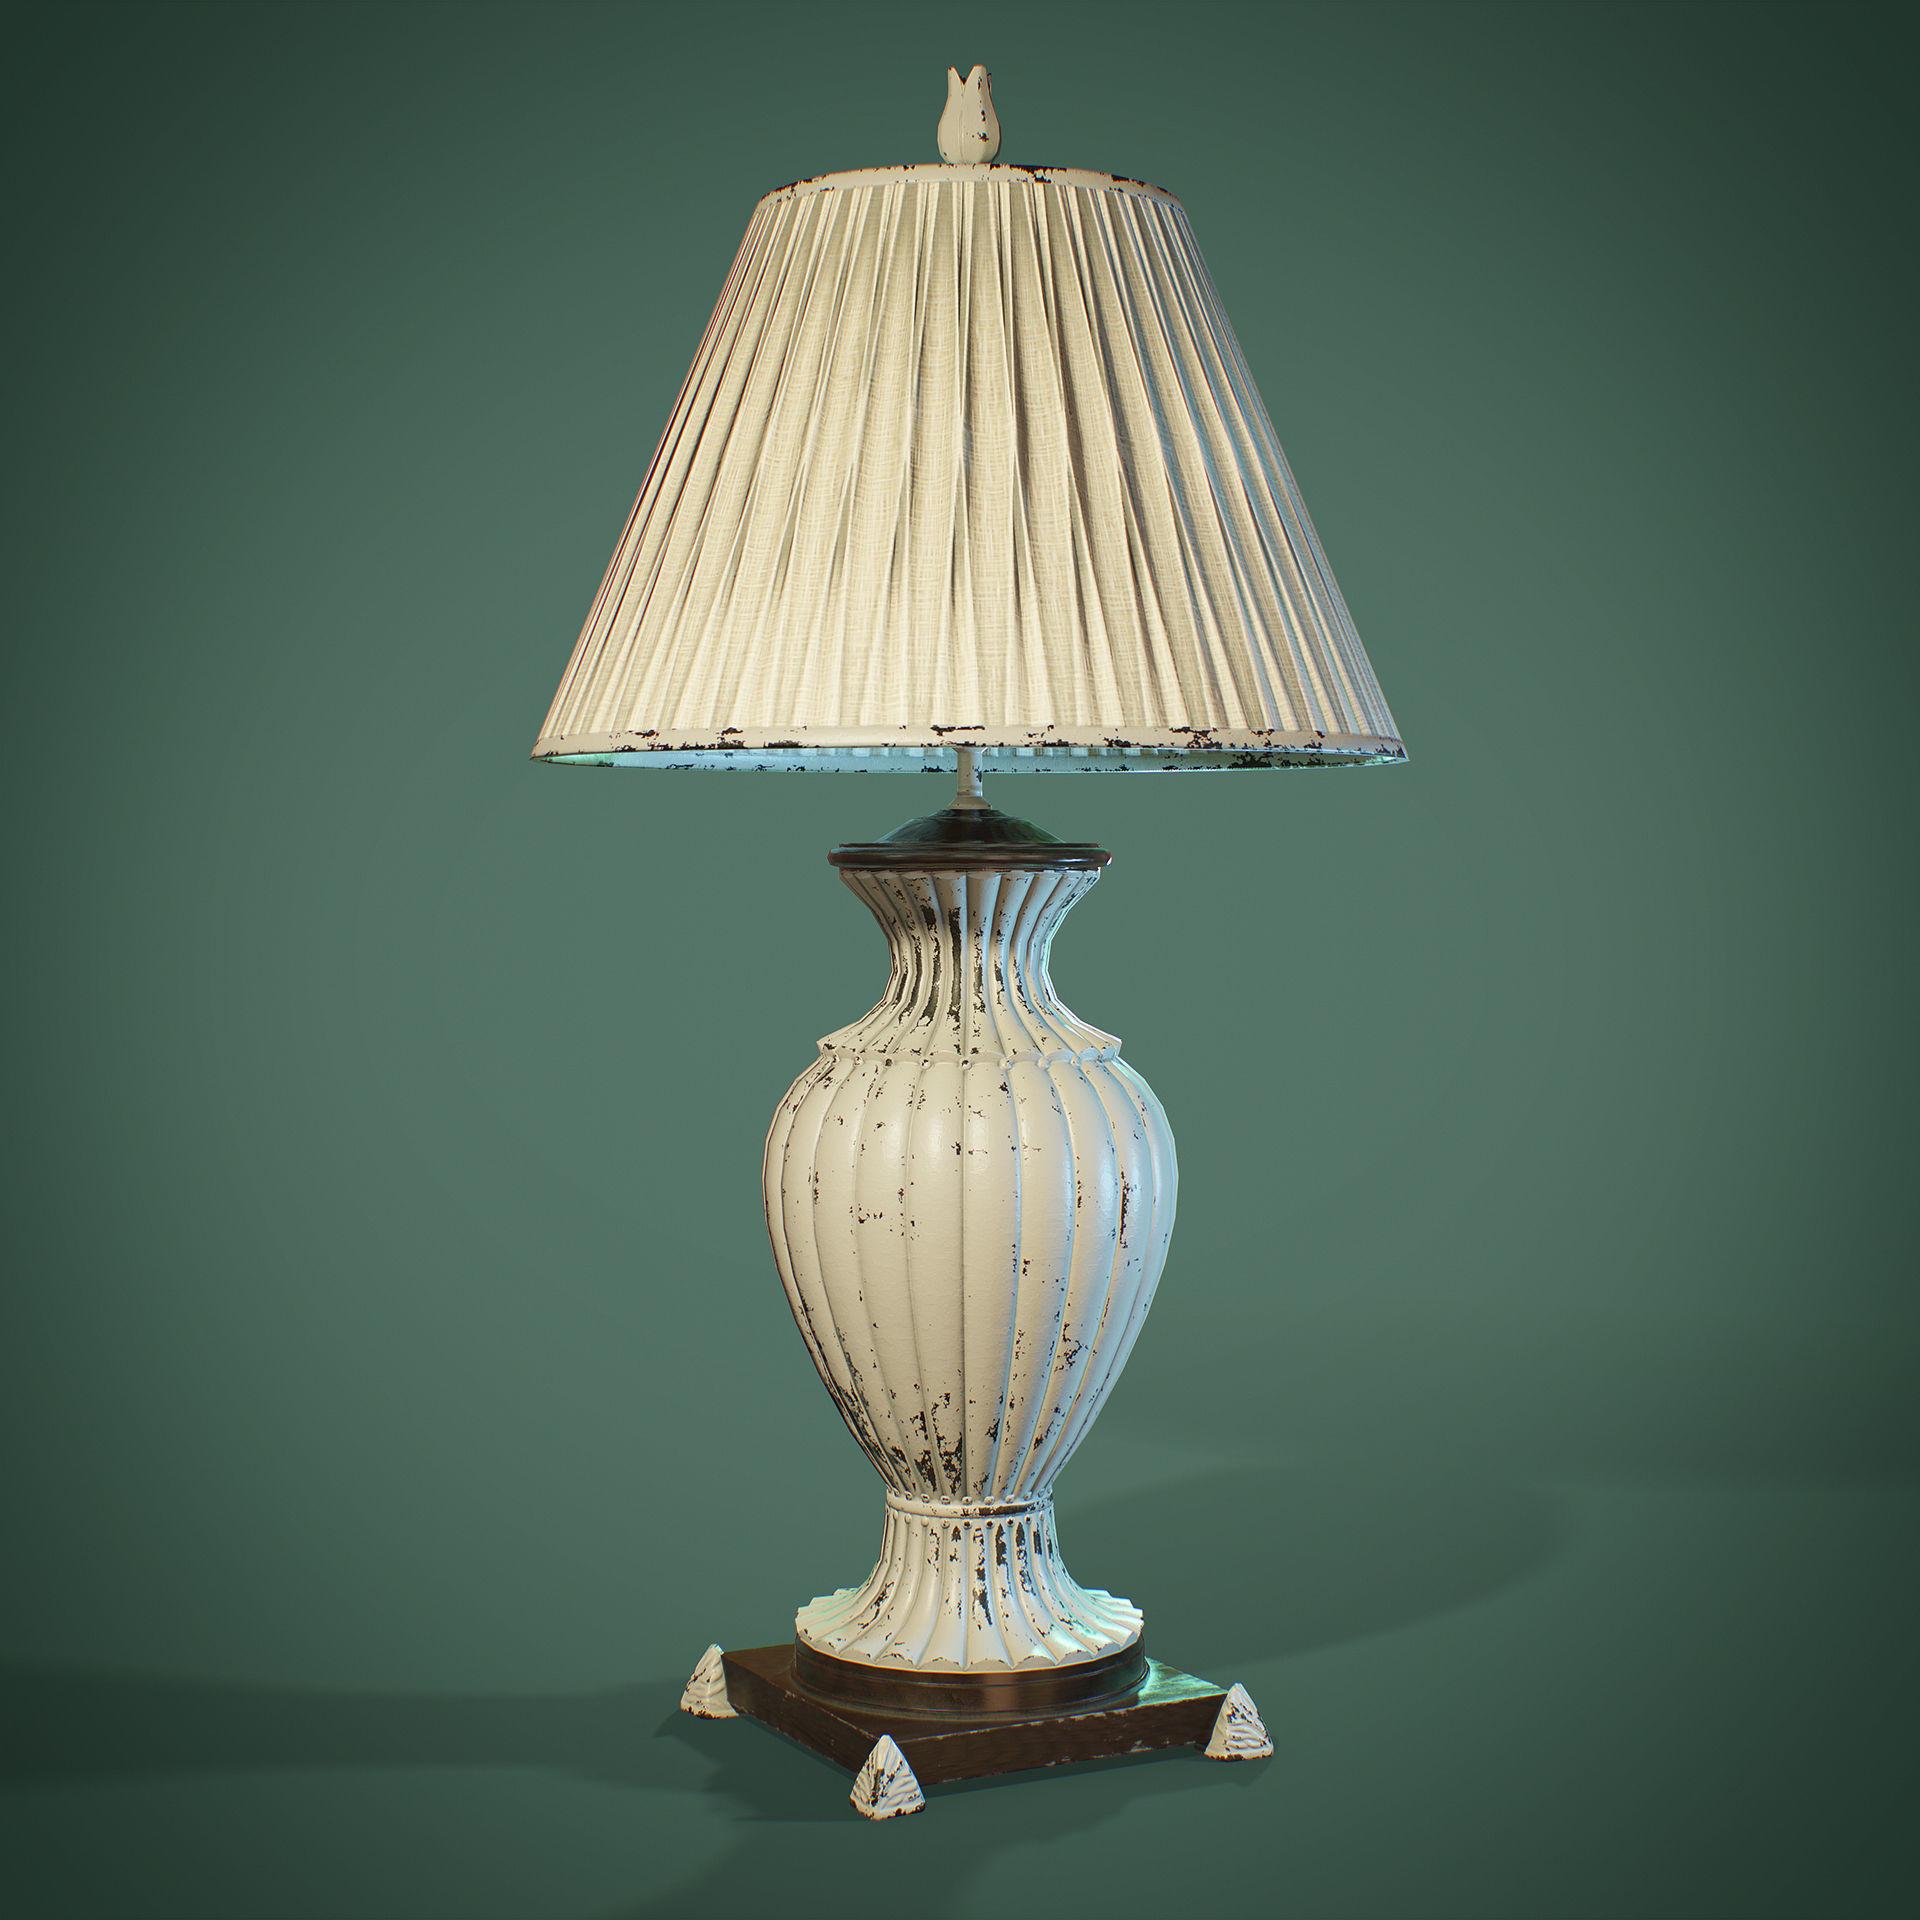 PBR Table Lamp